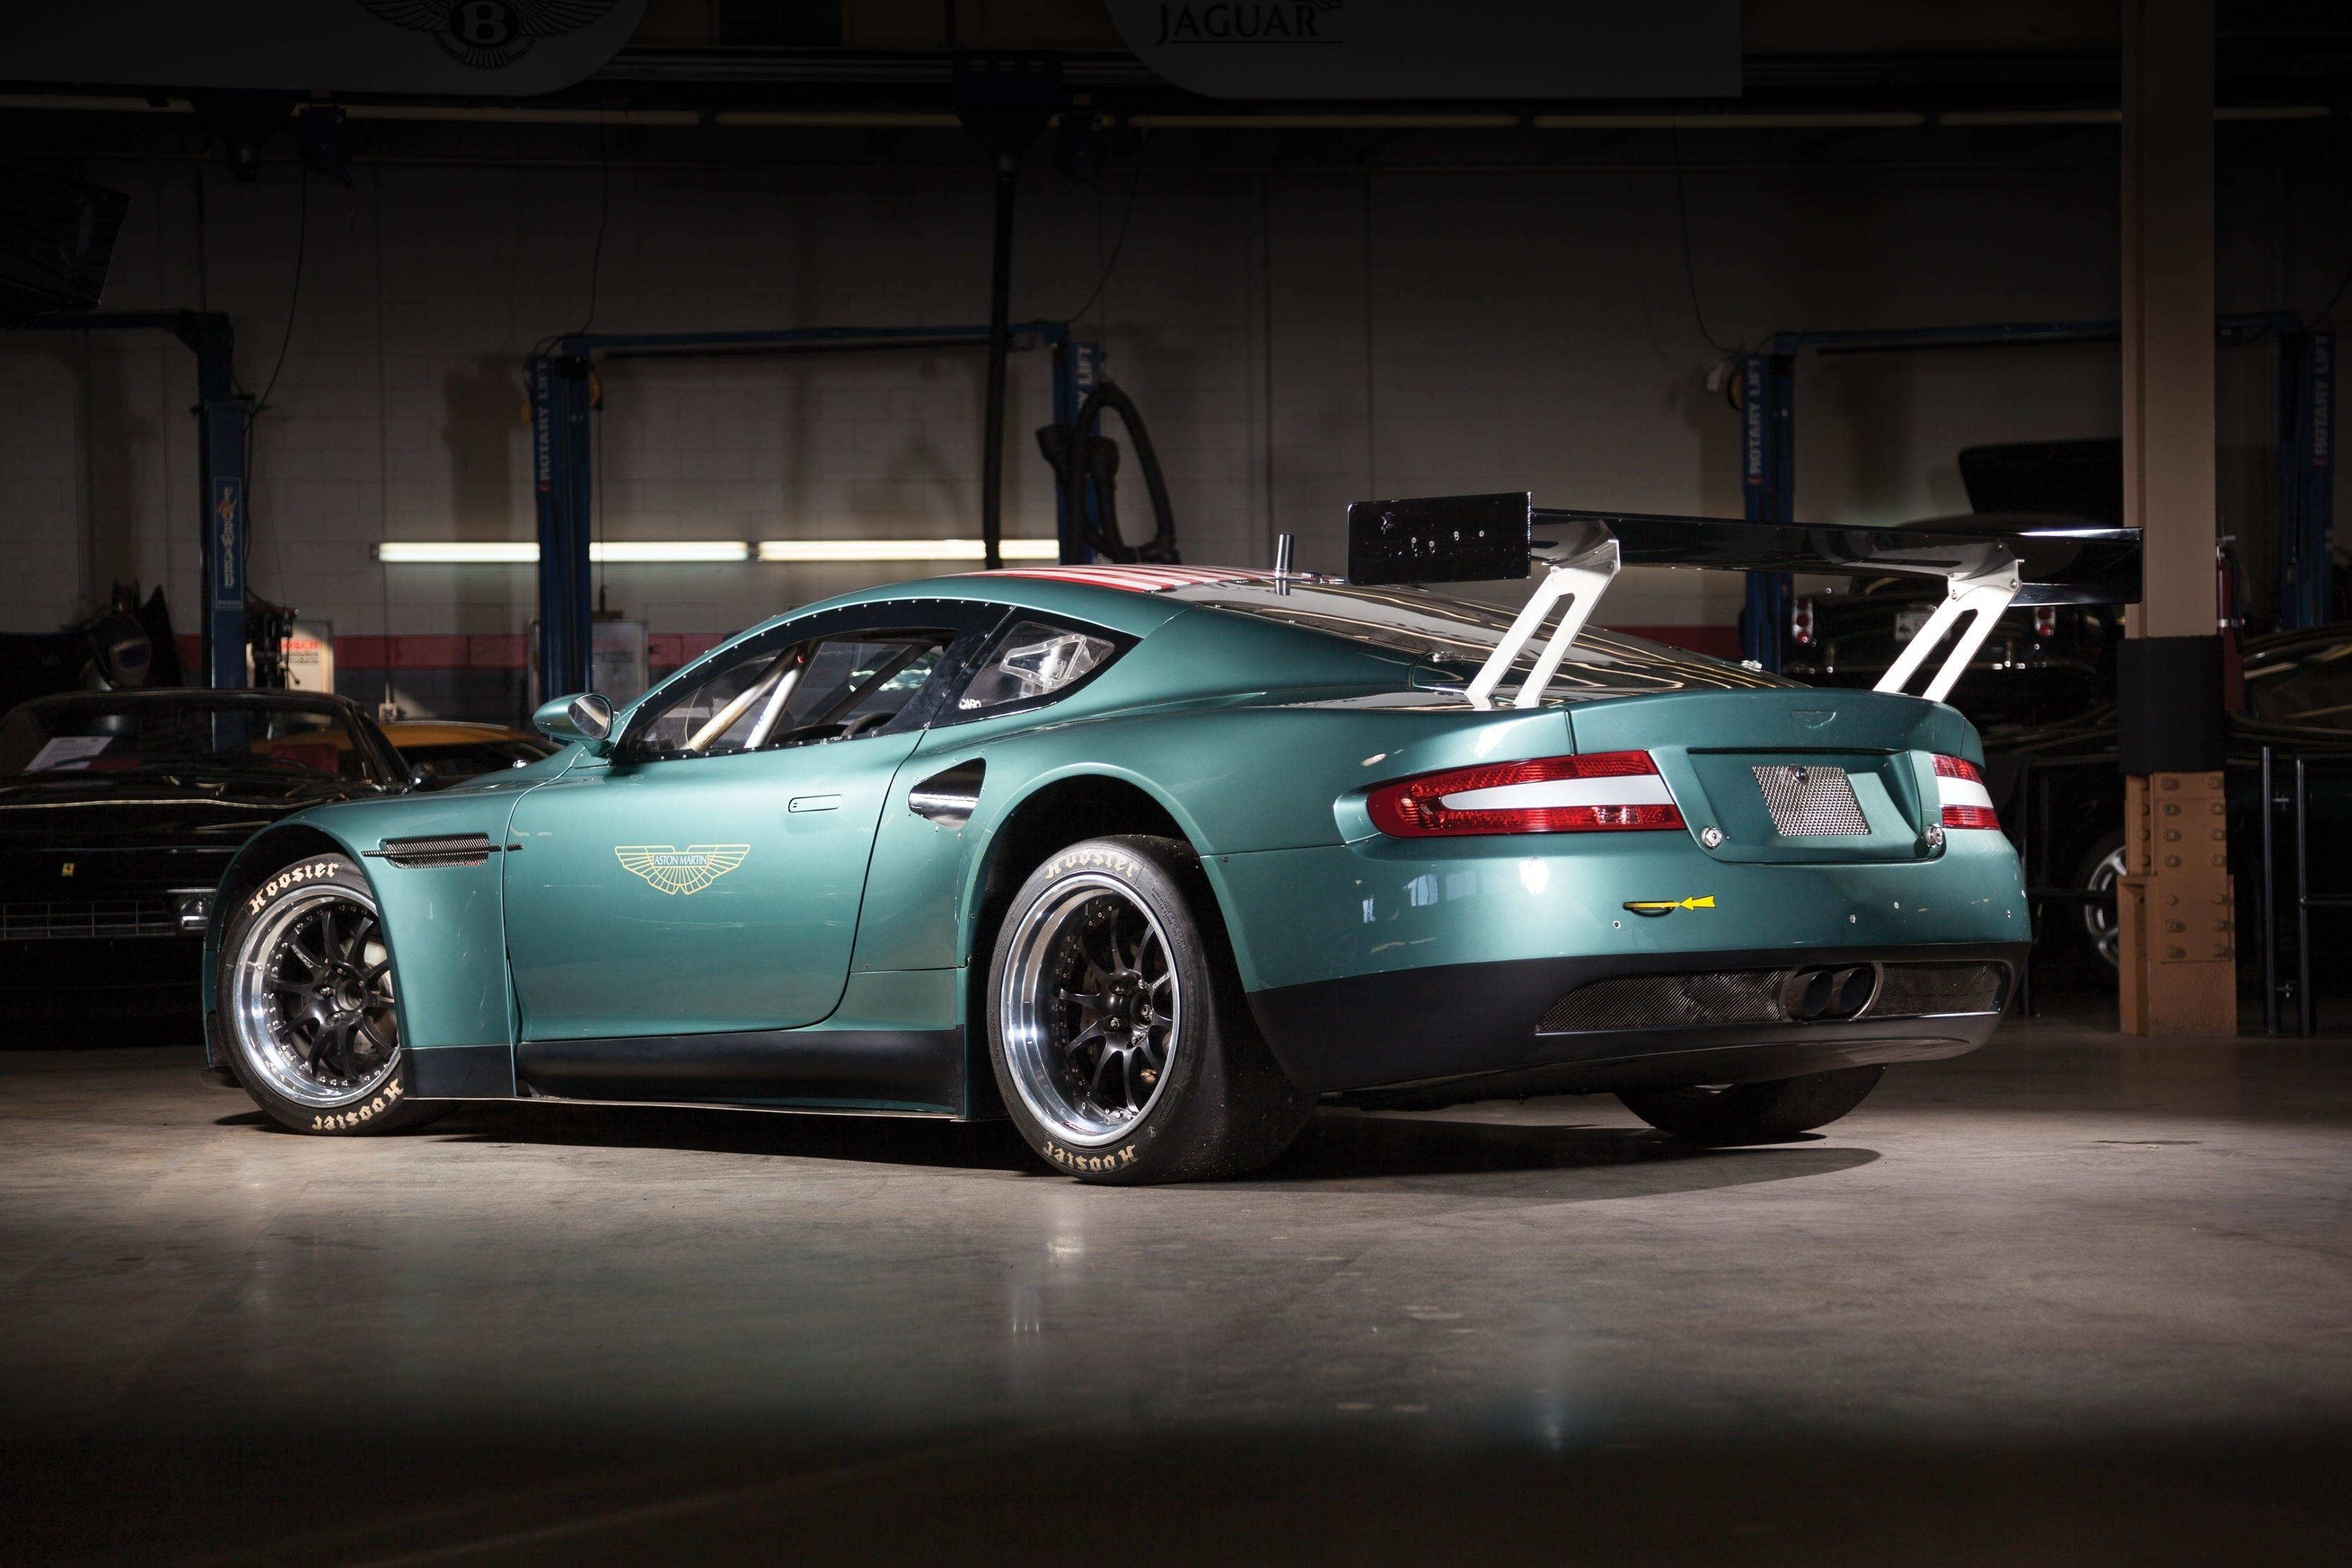 Aston Martin's DBRS9